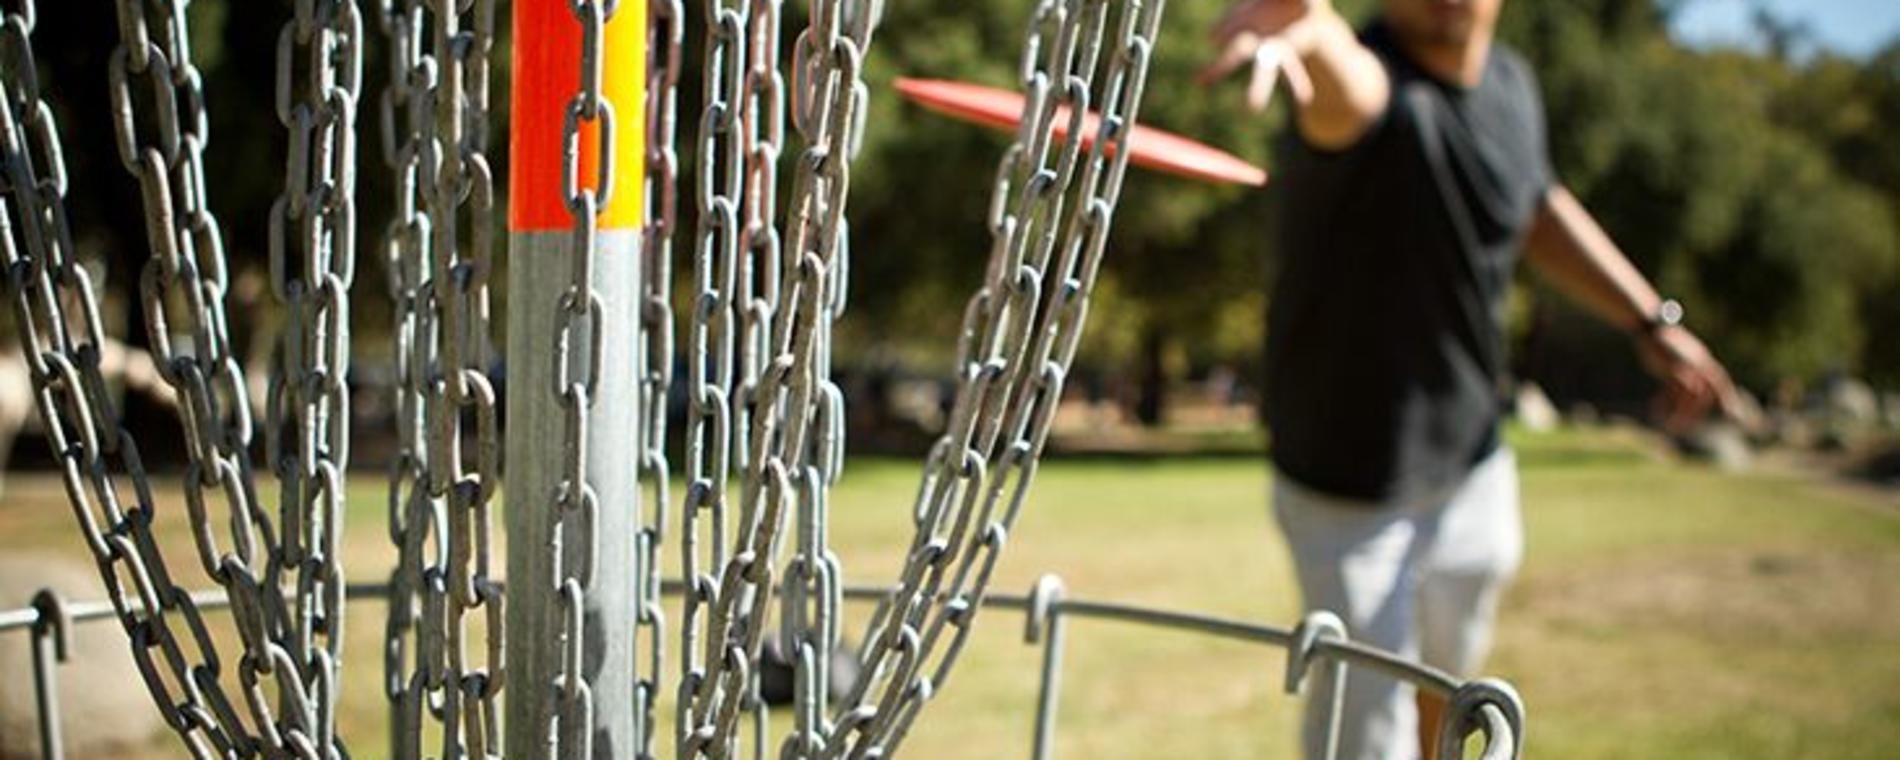 Disc Golf in Wichita, Kansas | Frisbee Golf Courses